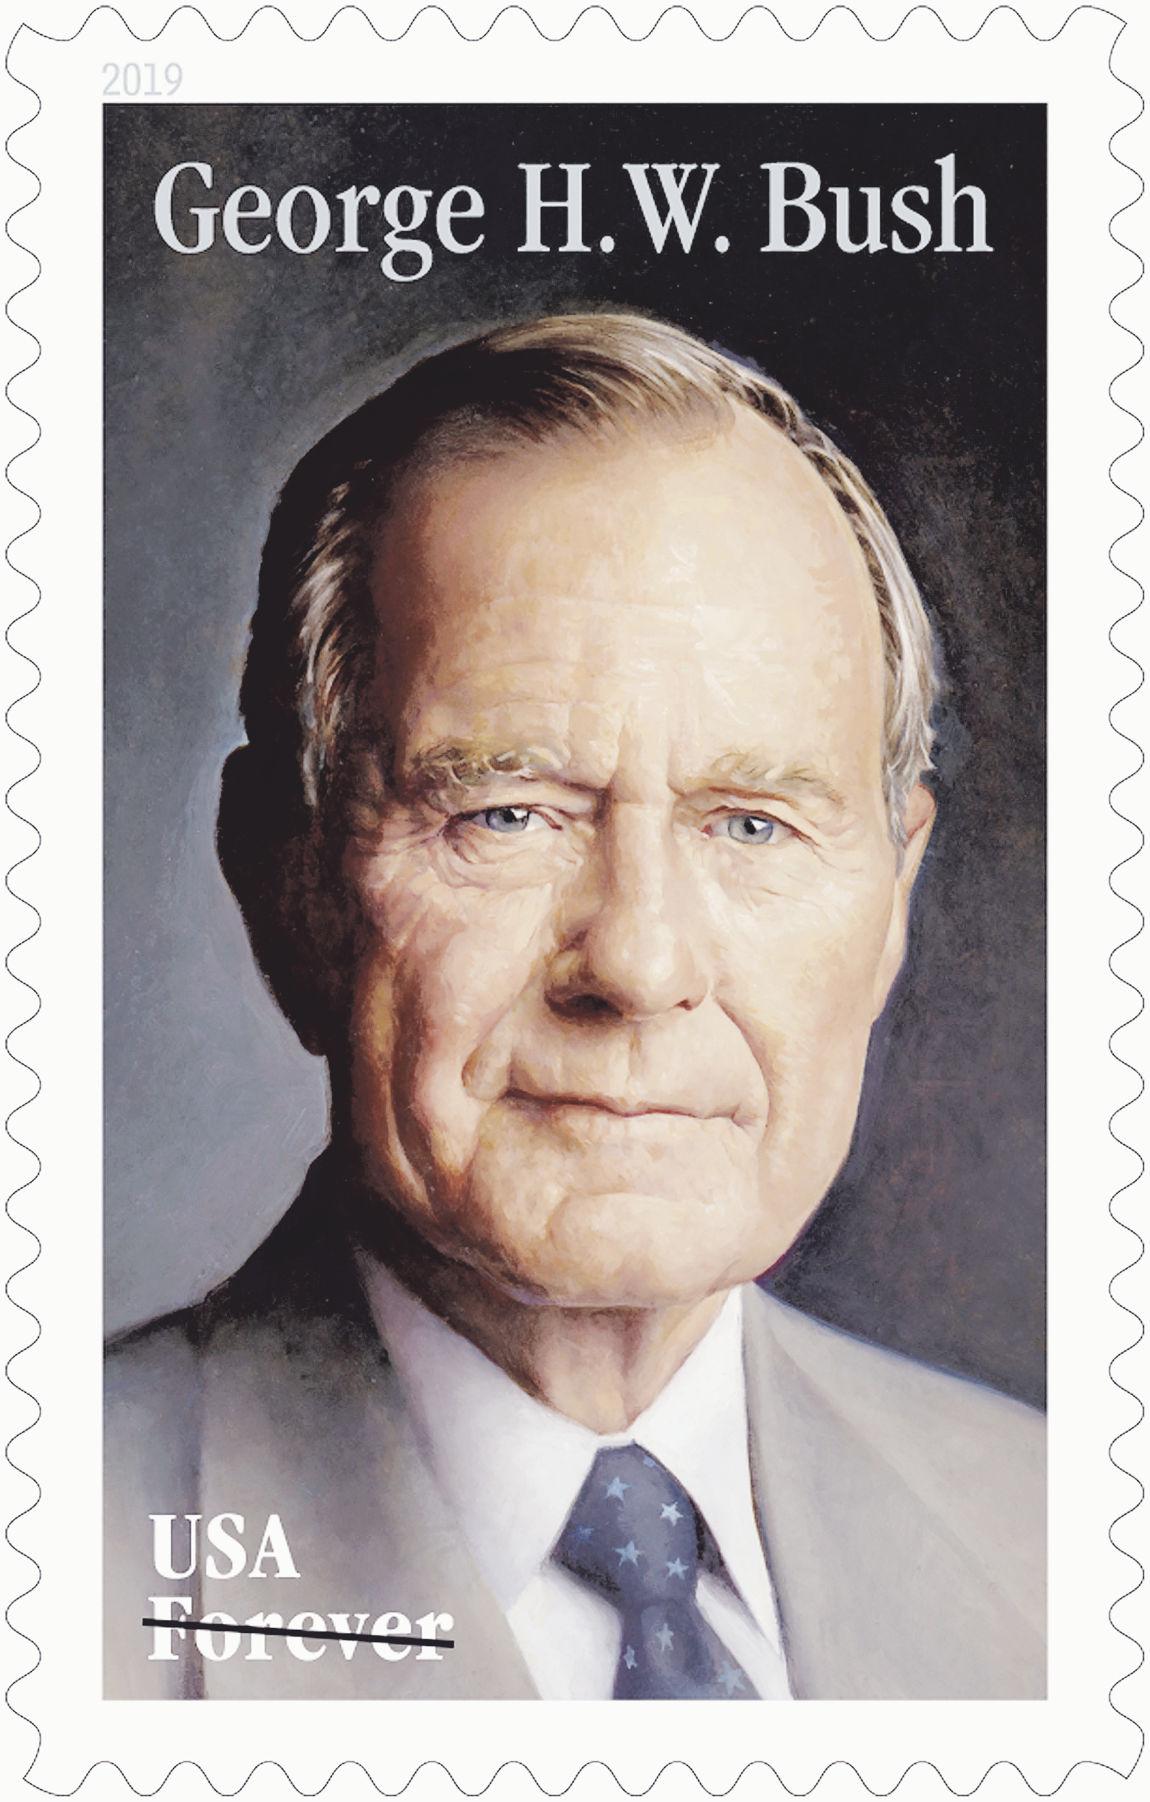 George HW Bush Stamp